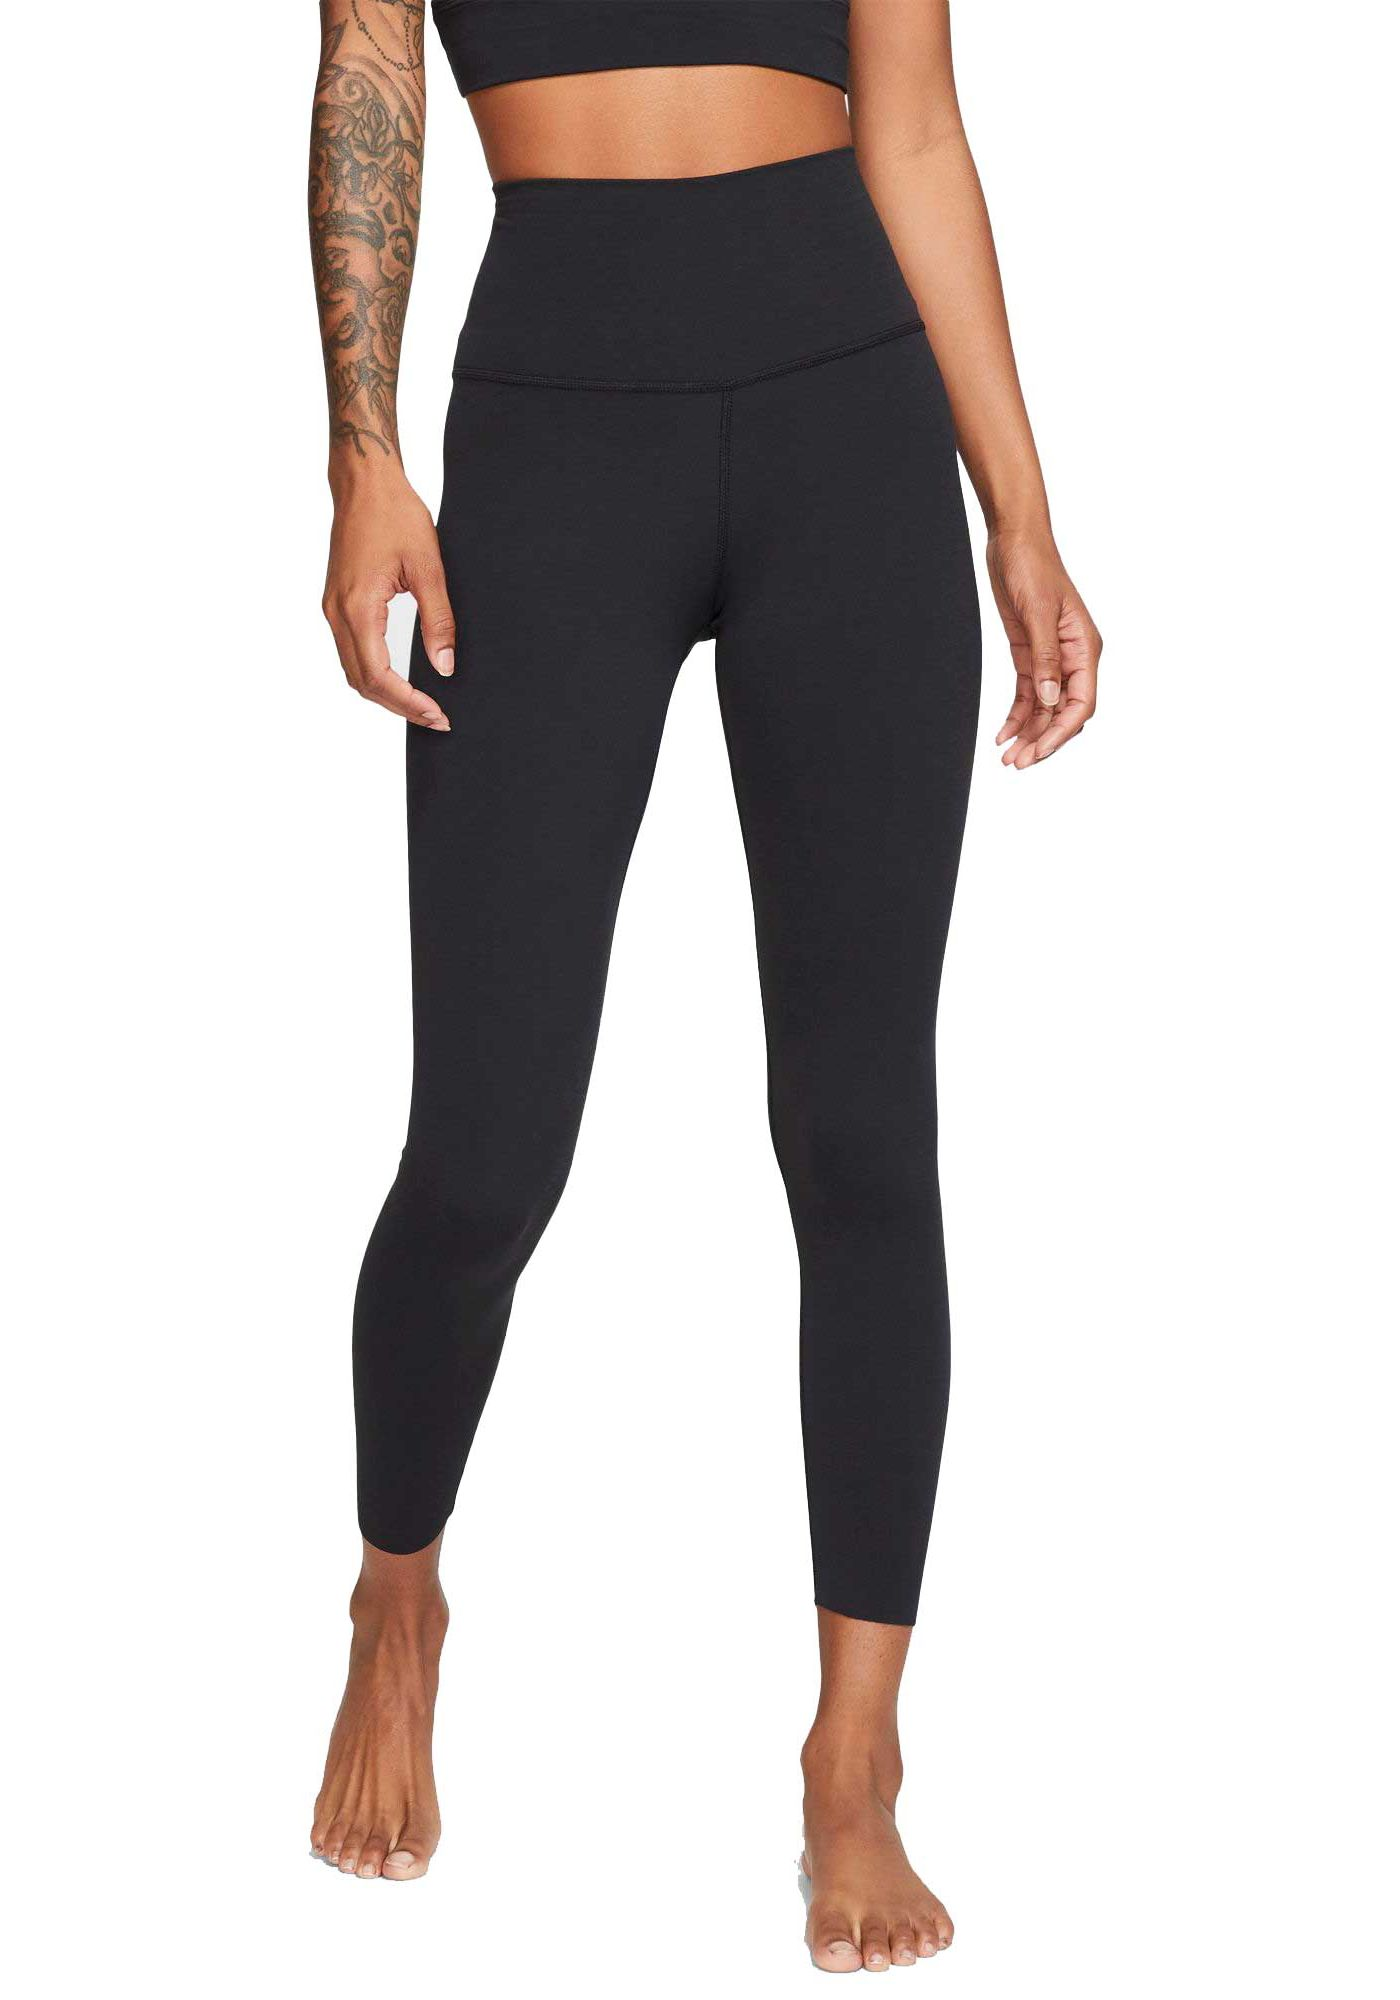 Nike Women's Yoga Luxe High Rise 7/8 Tights